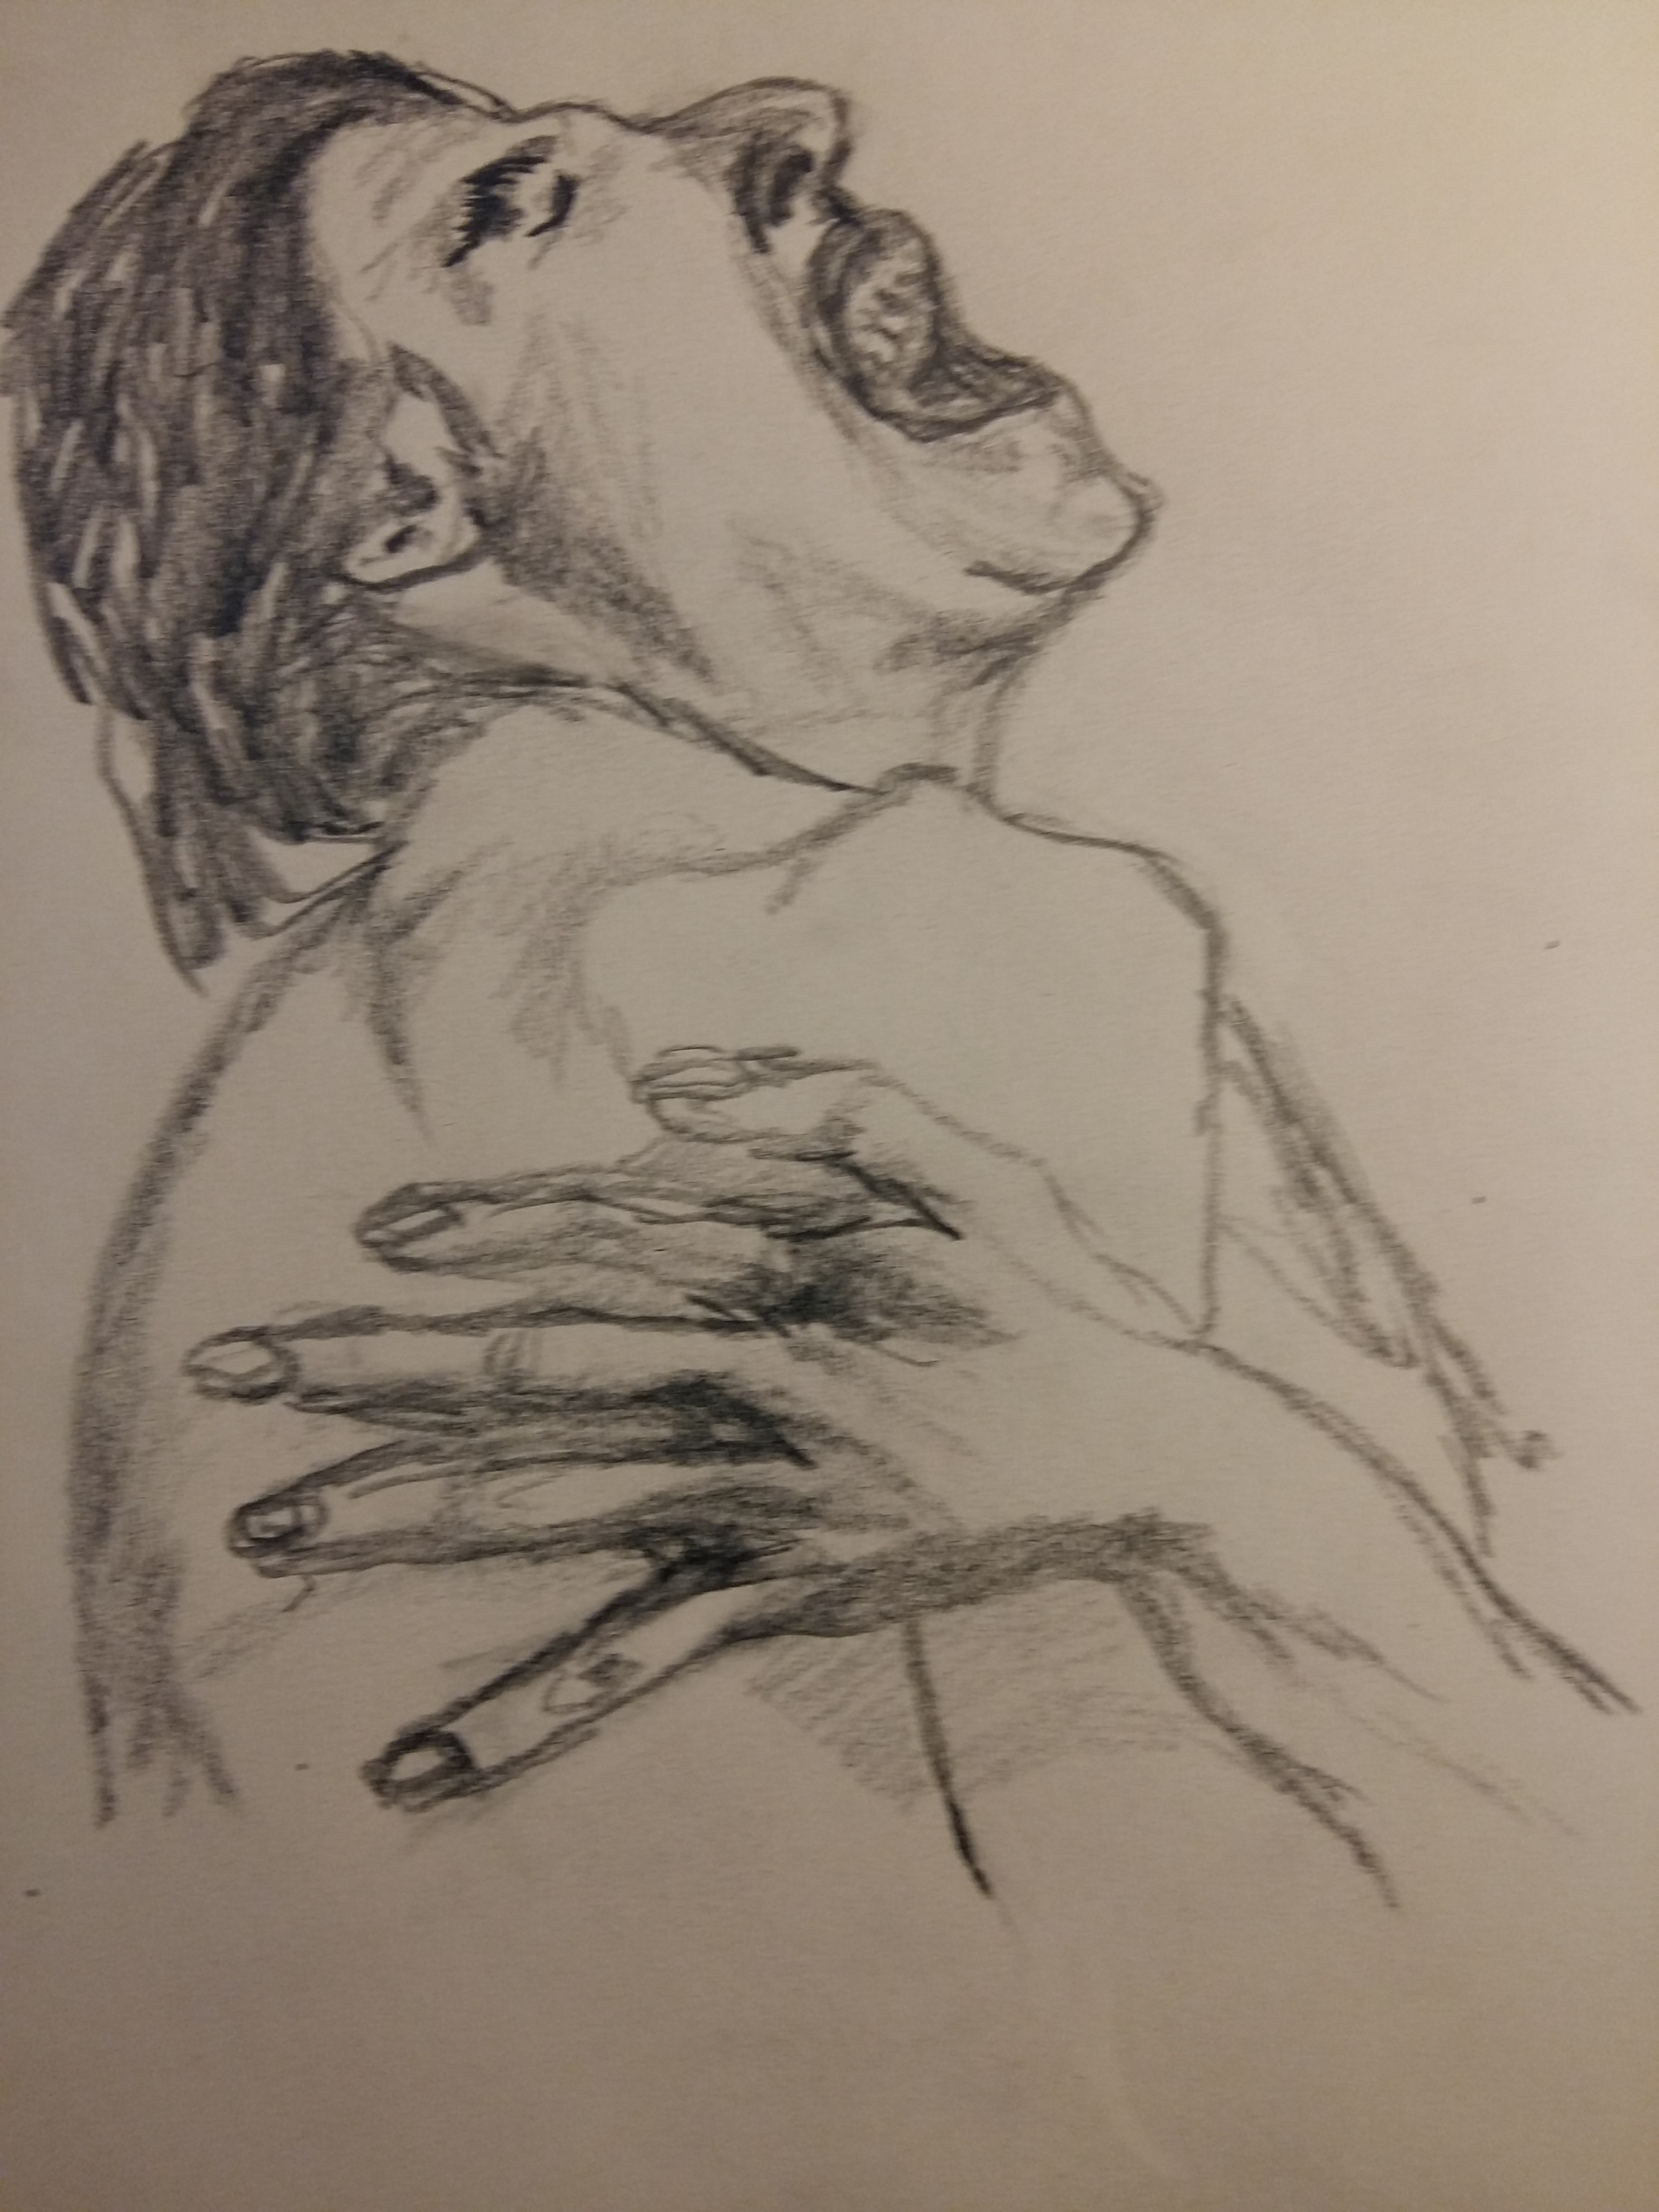 Dessin mine de plomb profil cris  cours de dessin